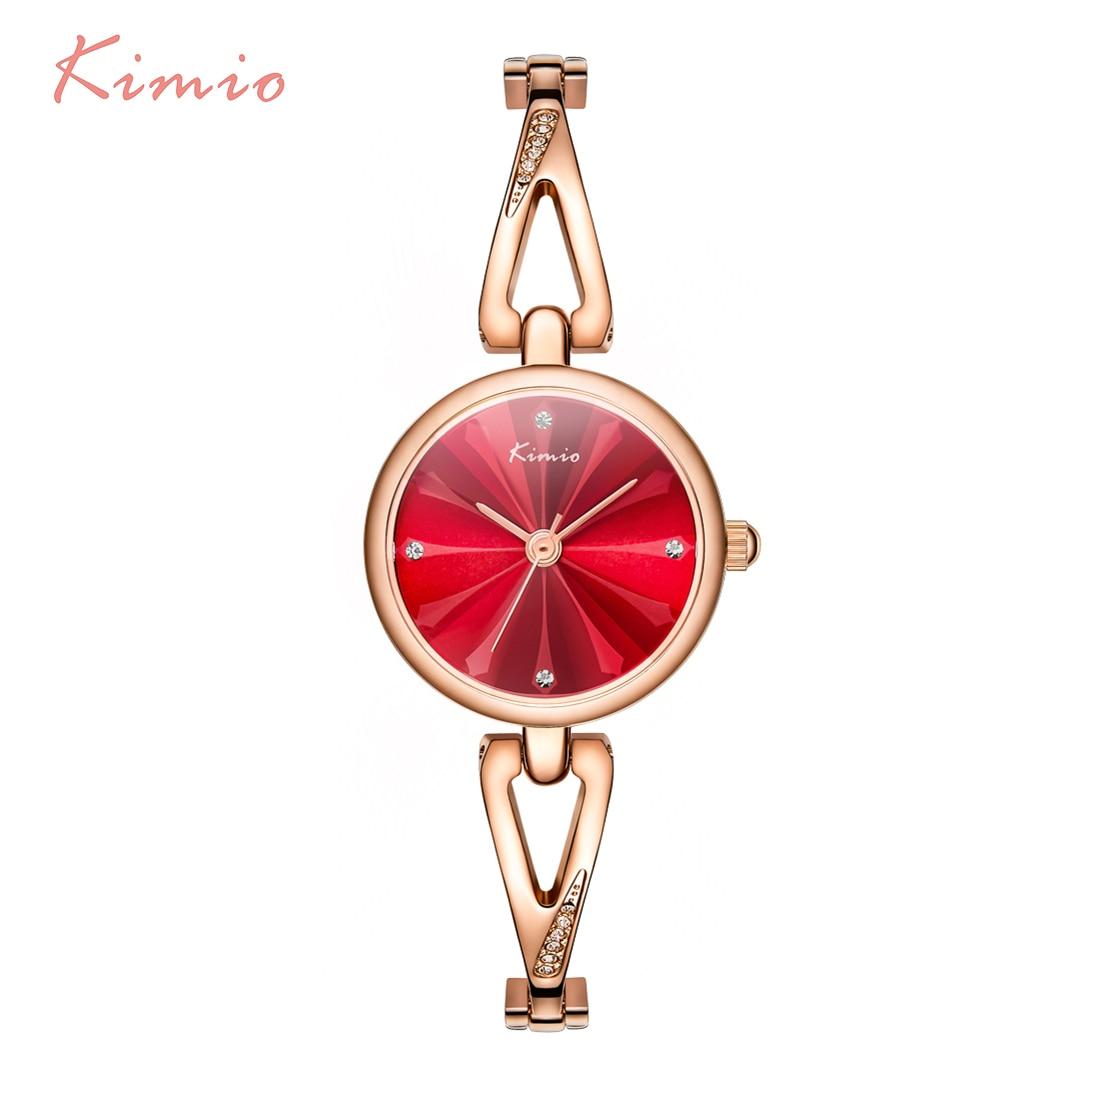 KIMIO Rose Gold Bracelet Watches For Women Wristwatch Quartz Women 39 s Watch Brand Luxury Fashion Ladies Watch Relojes Mujer 2018 in Women 39 s Watches from Watches